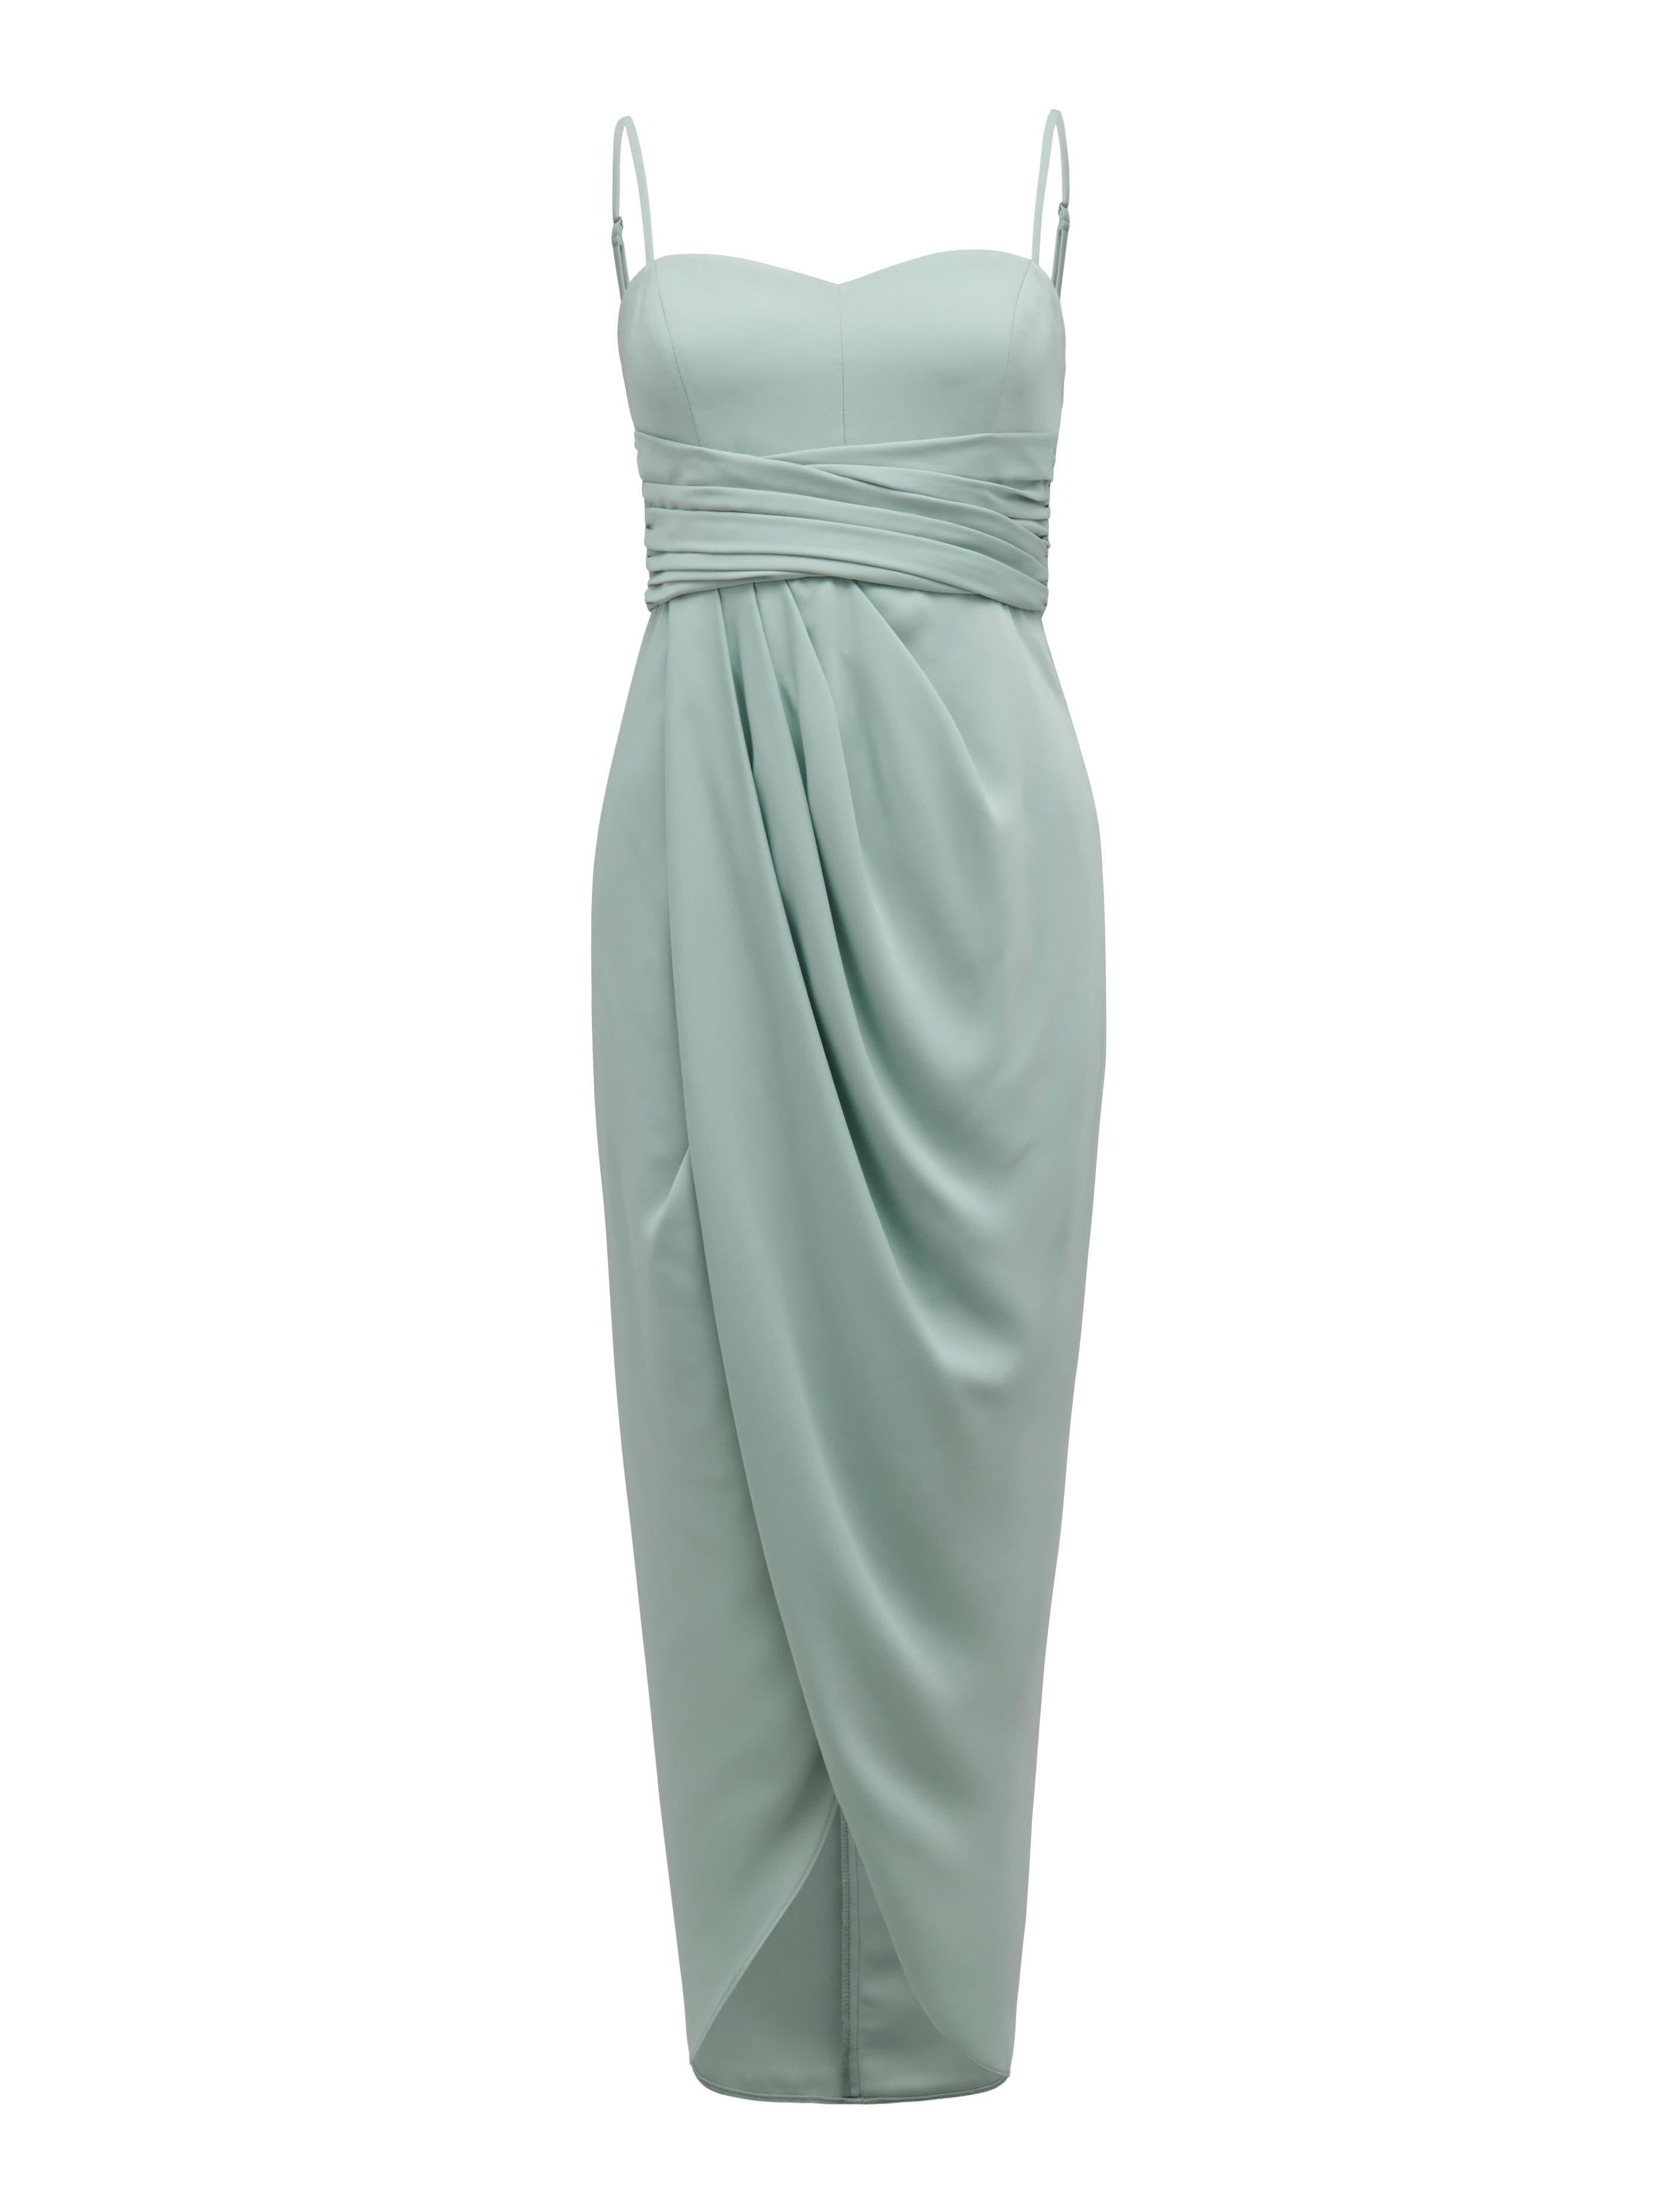 Whitney Sweetheart Drape Maxi Women S Fashion Forever New Drape Maxi Dress Dresses Fashion Mannequin [ 3742 x 2844 Pixel ]